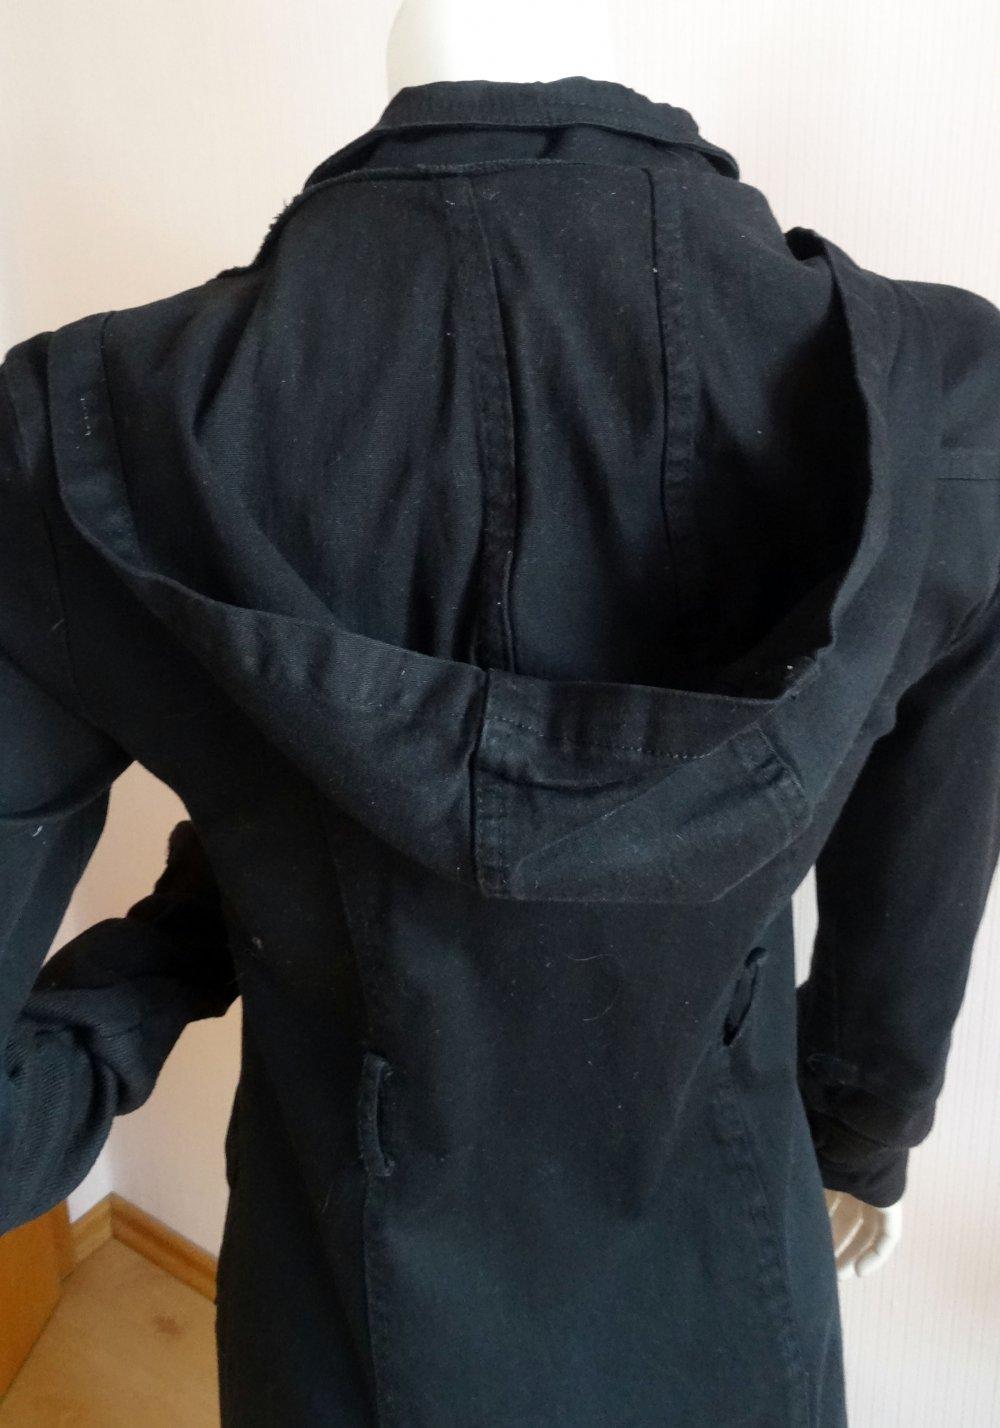 low priced 16945 f287d schwarze Übergangsjacke schmal geschnitten Madonna